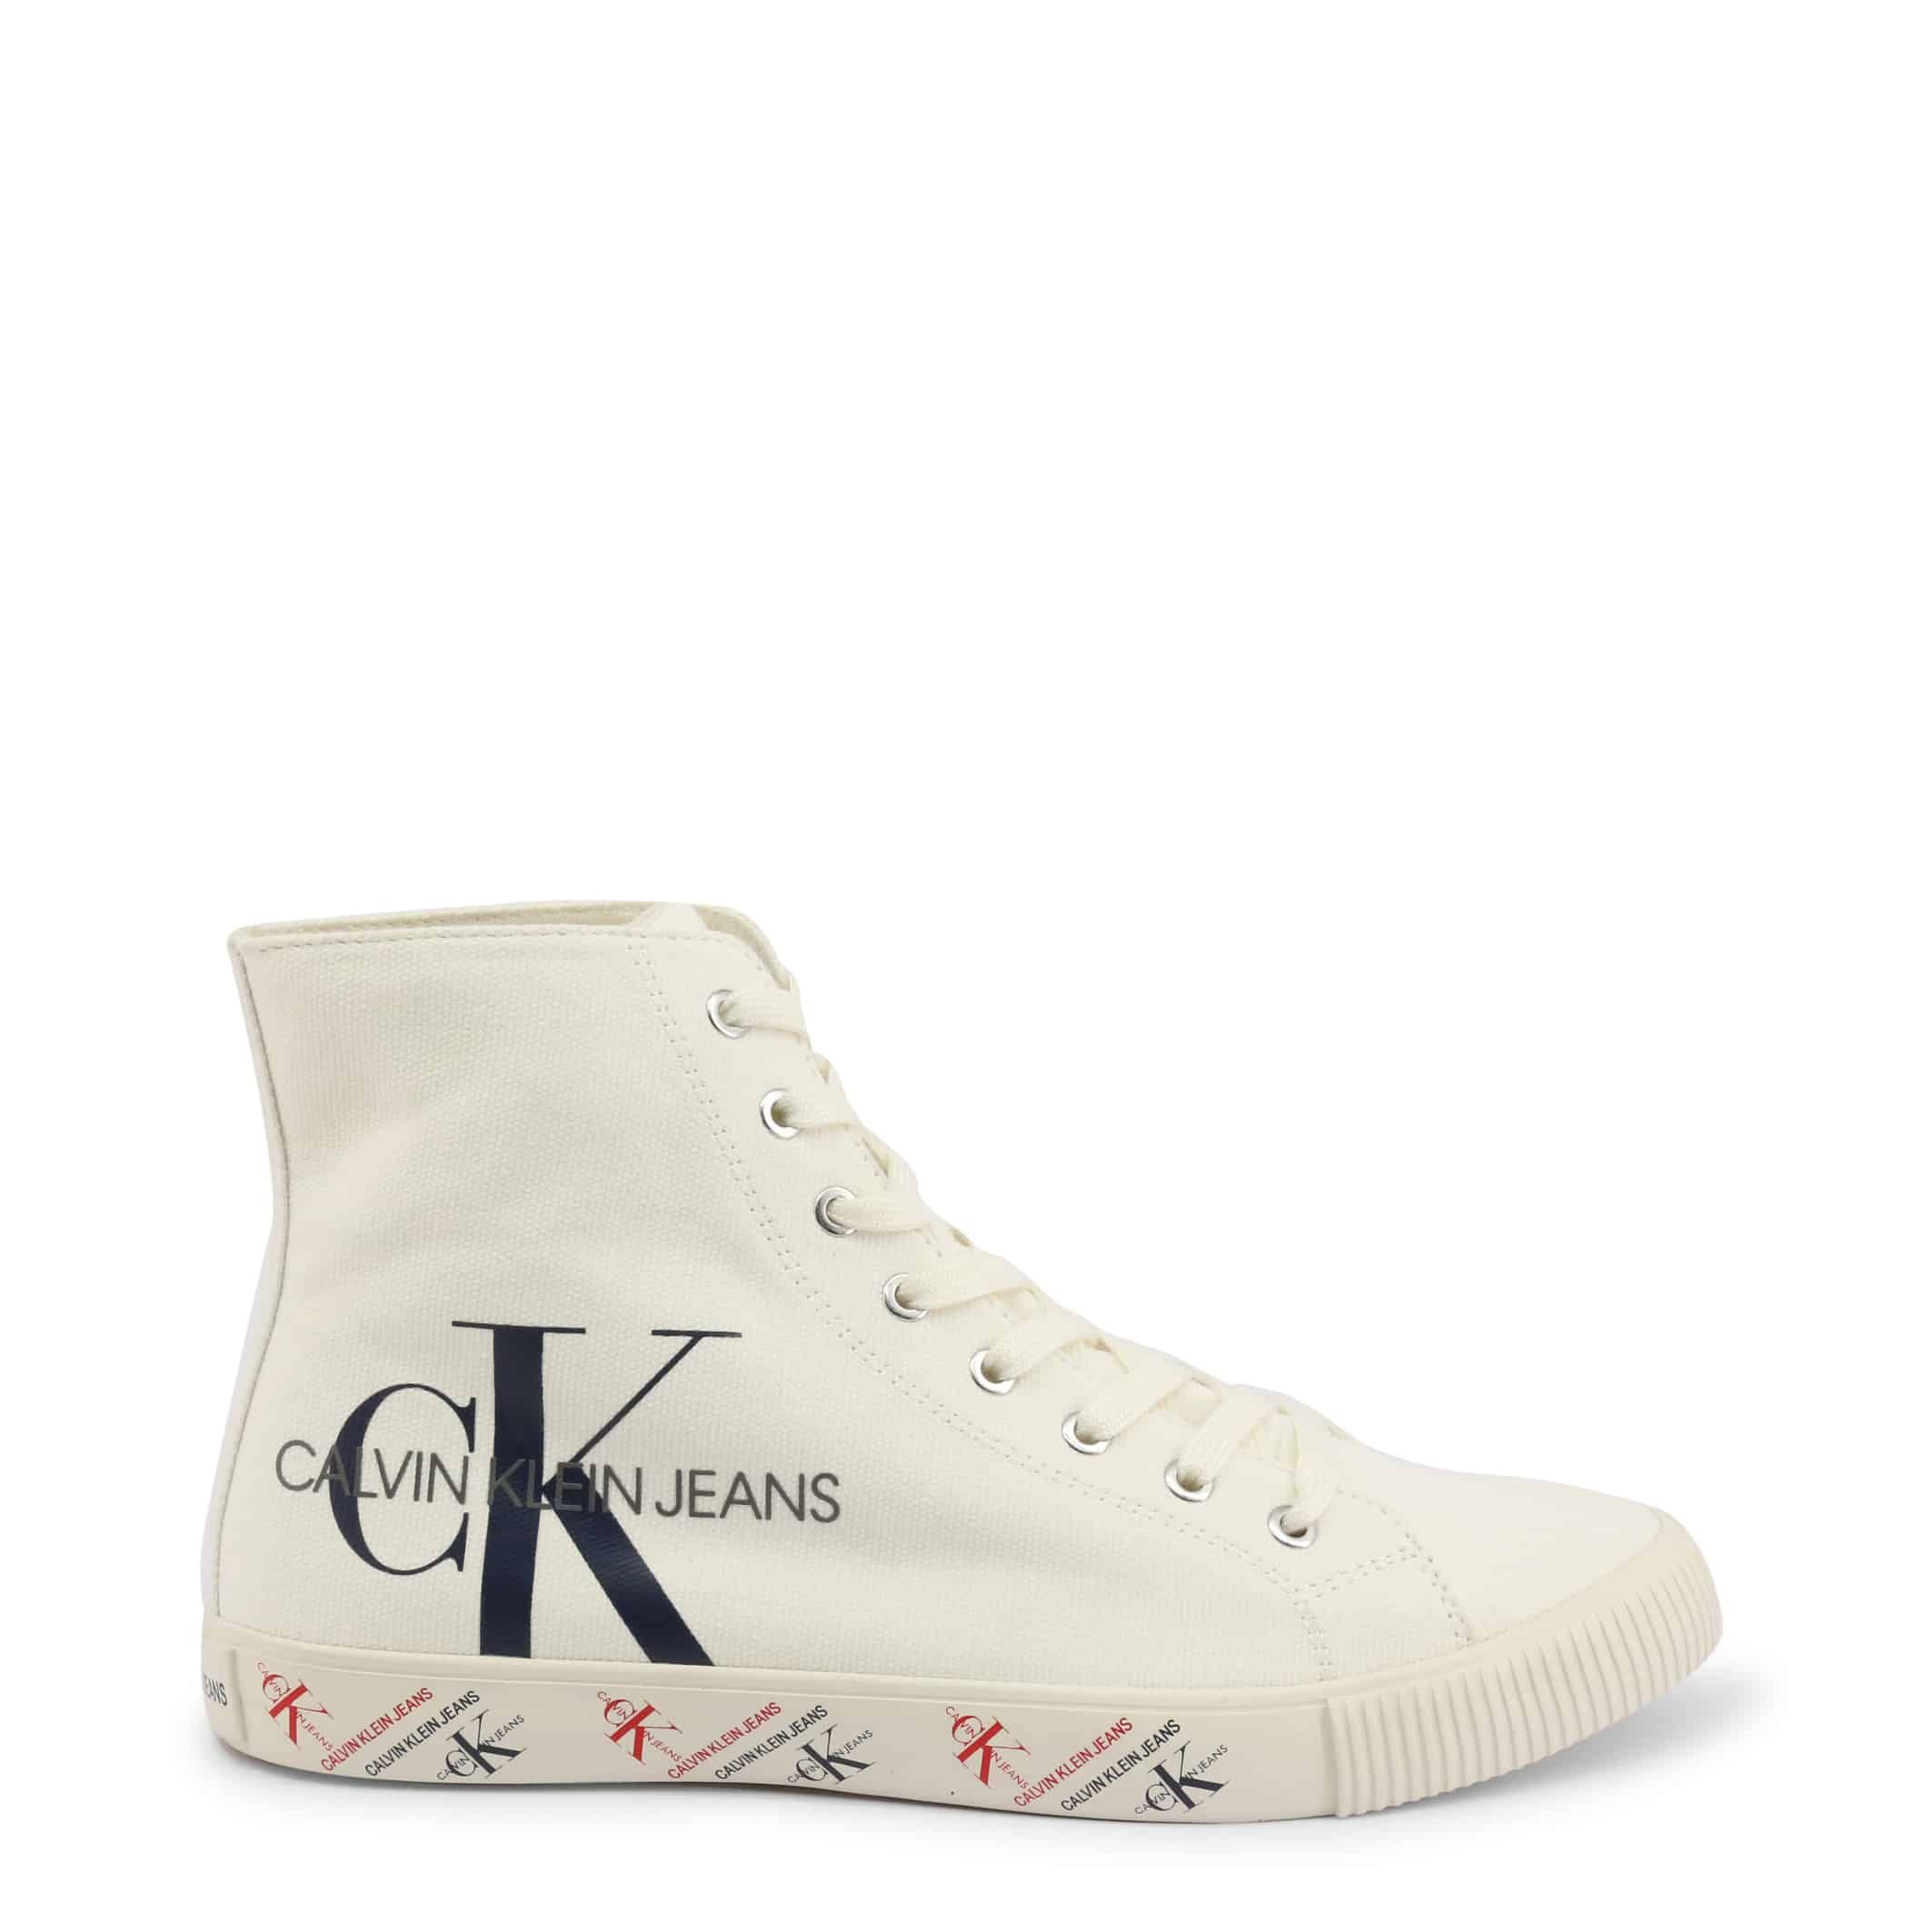 Calvin Klein – ASTON_B4S0669 – Blanco